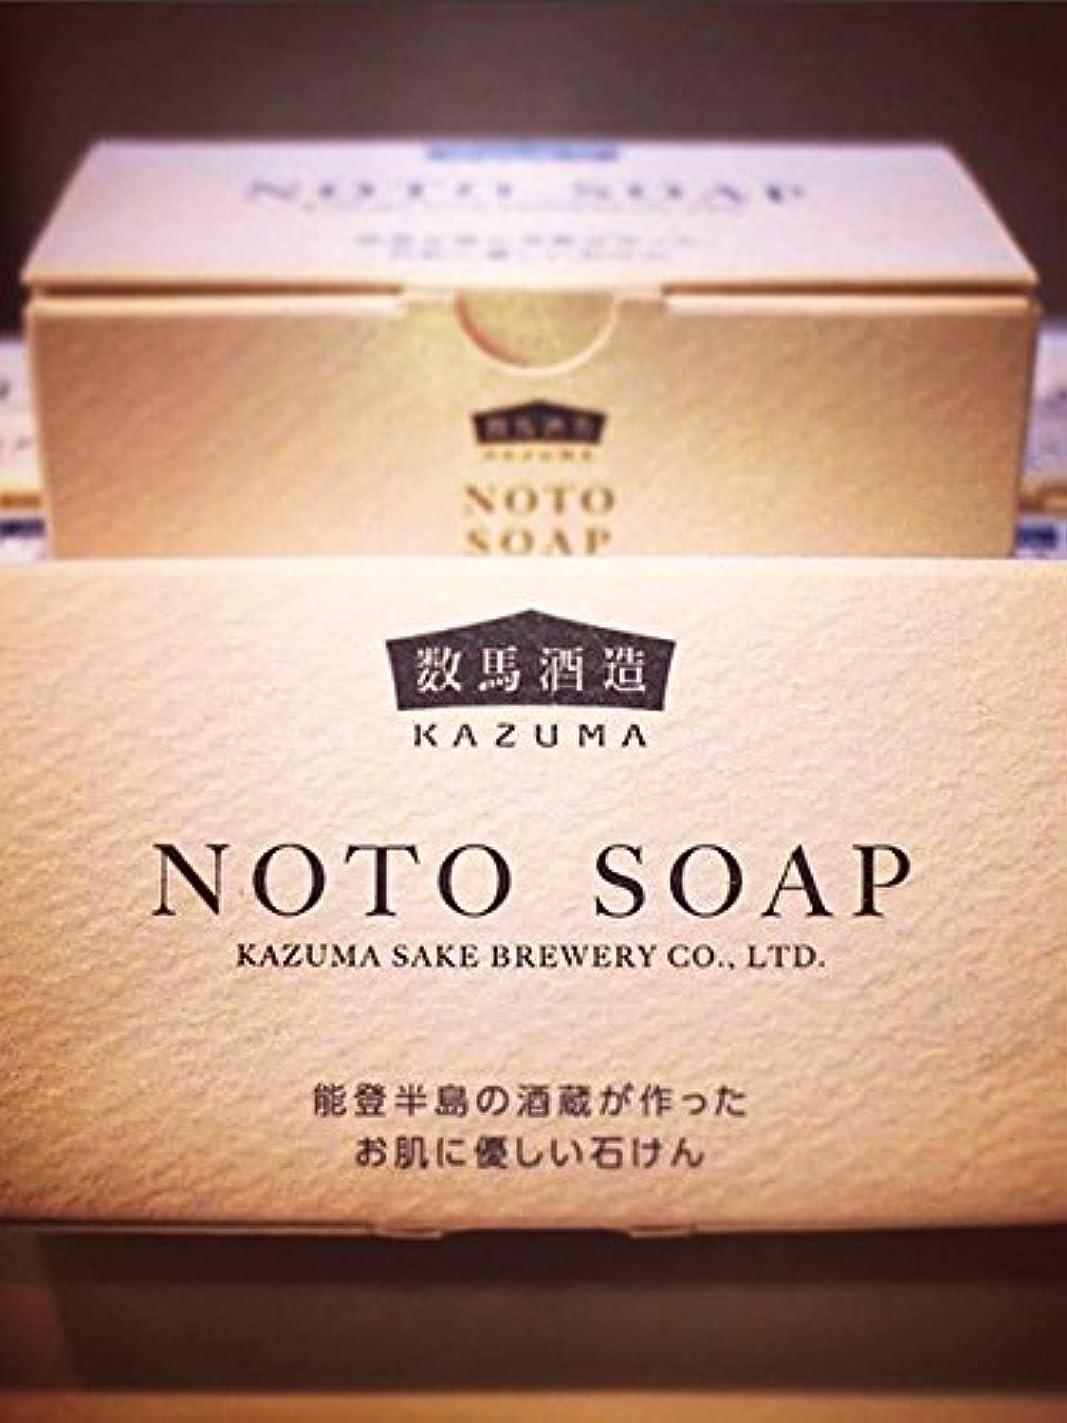 大砲難破船書き込み竹葉 NOTO SOAP 酒粕石鹸 1個80g